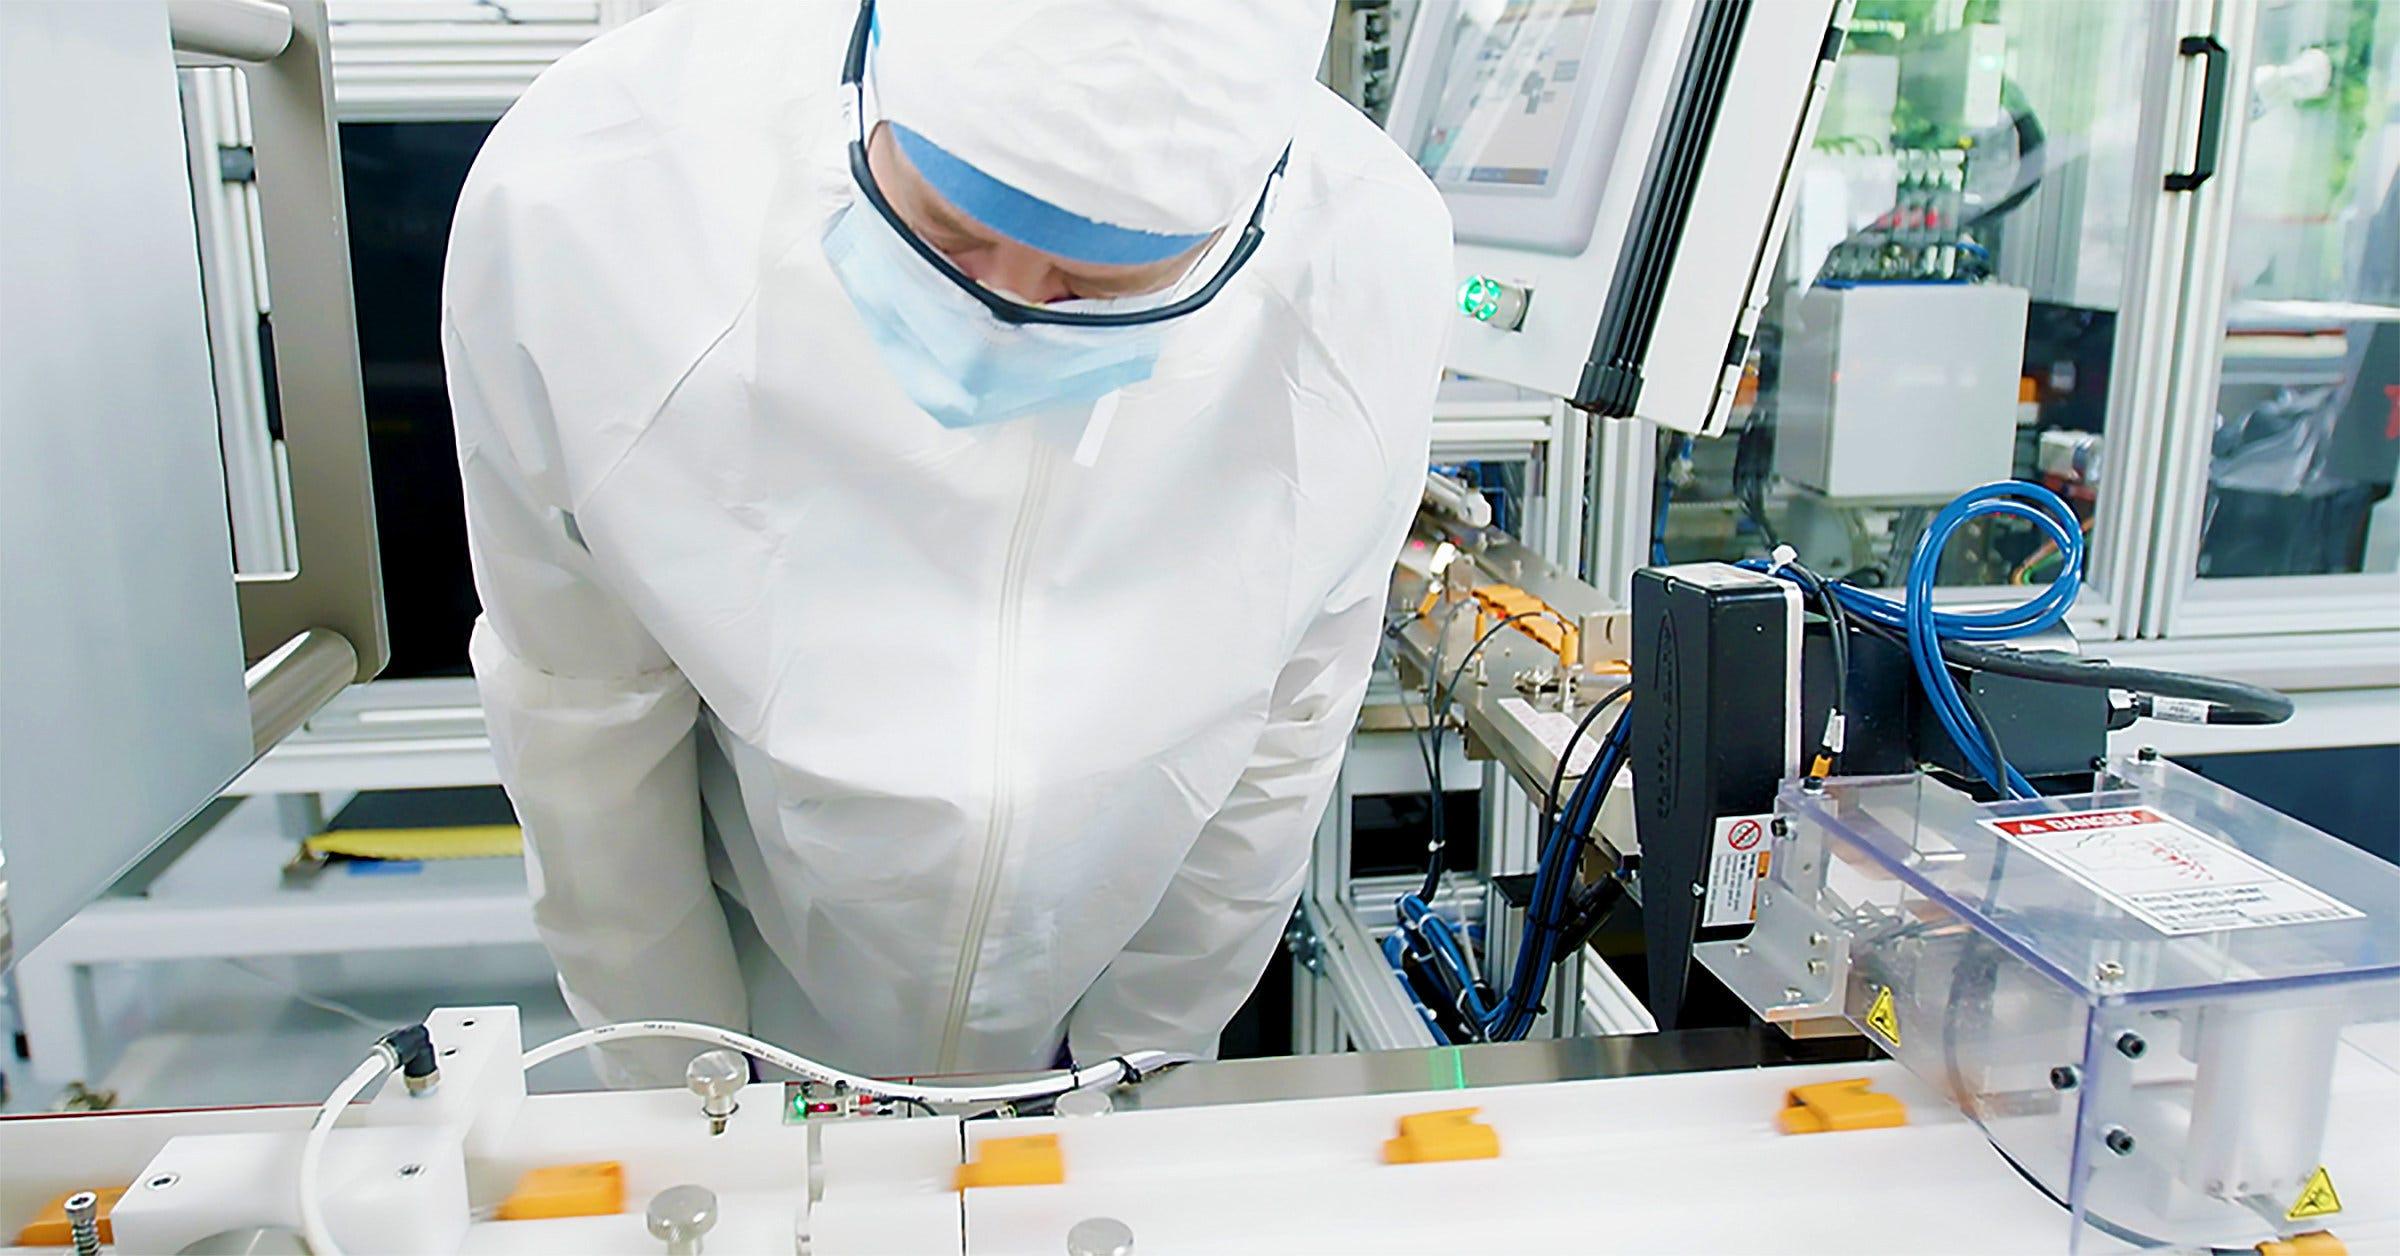 Will Abbott Labs Live Up To Coronavirus Testing Expectations